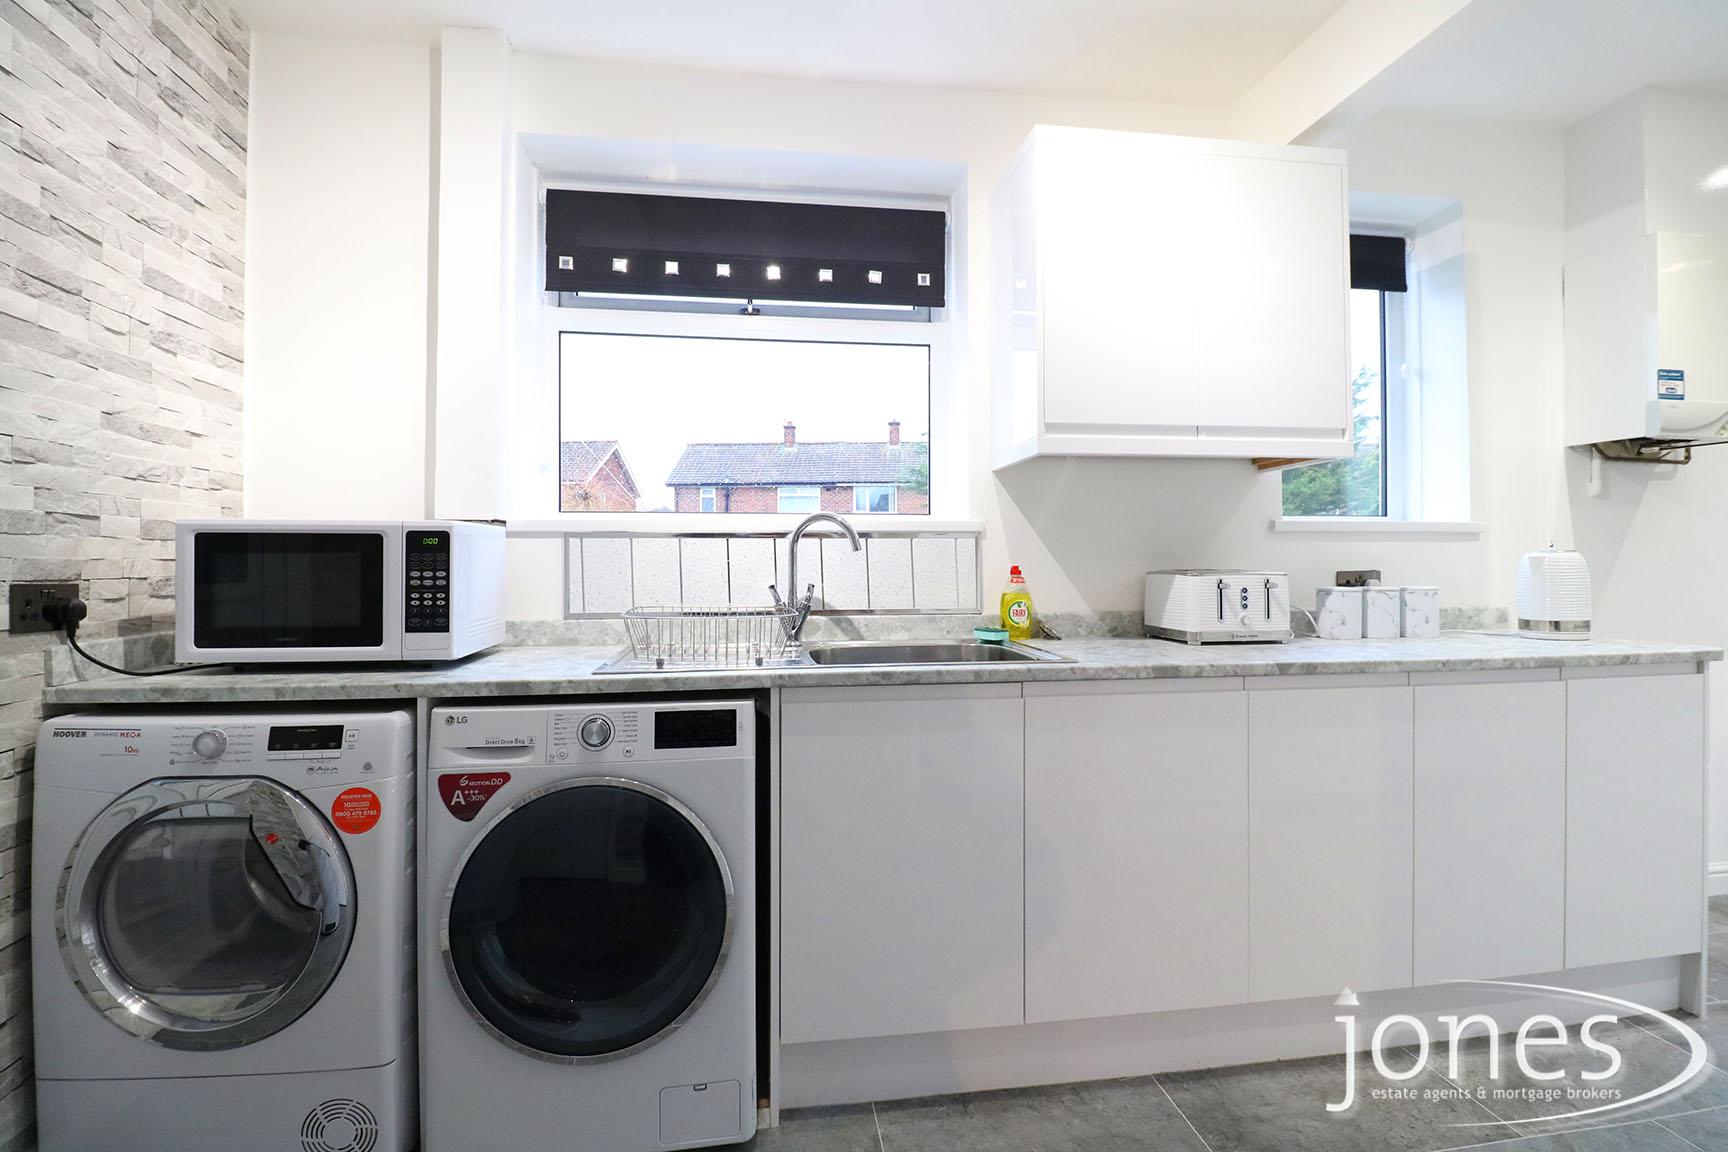 Home for Sale Let - Photo 05 Feetham Avenue, Darlington, DL1 2DY